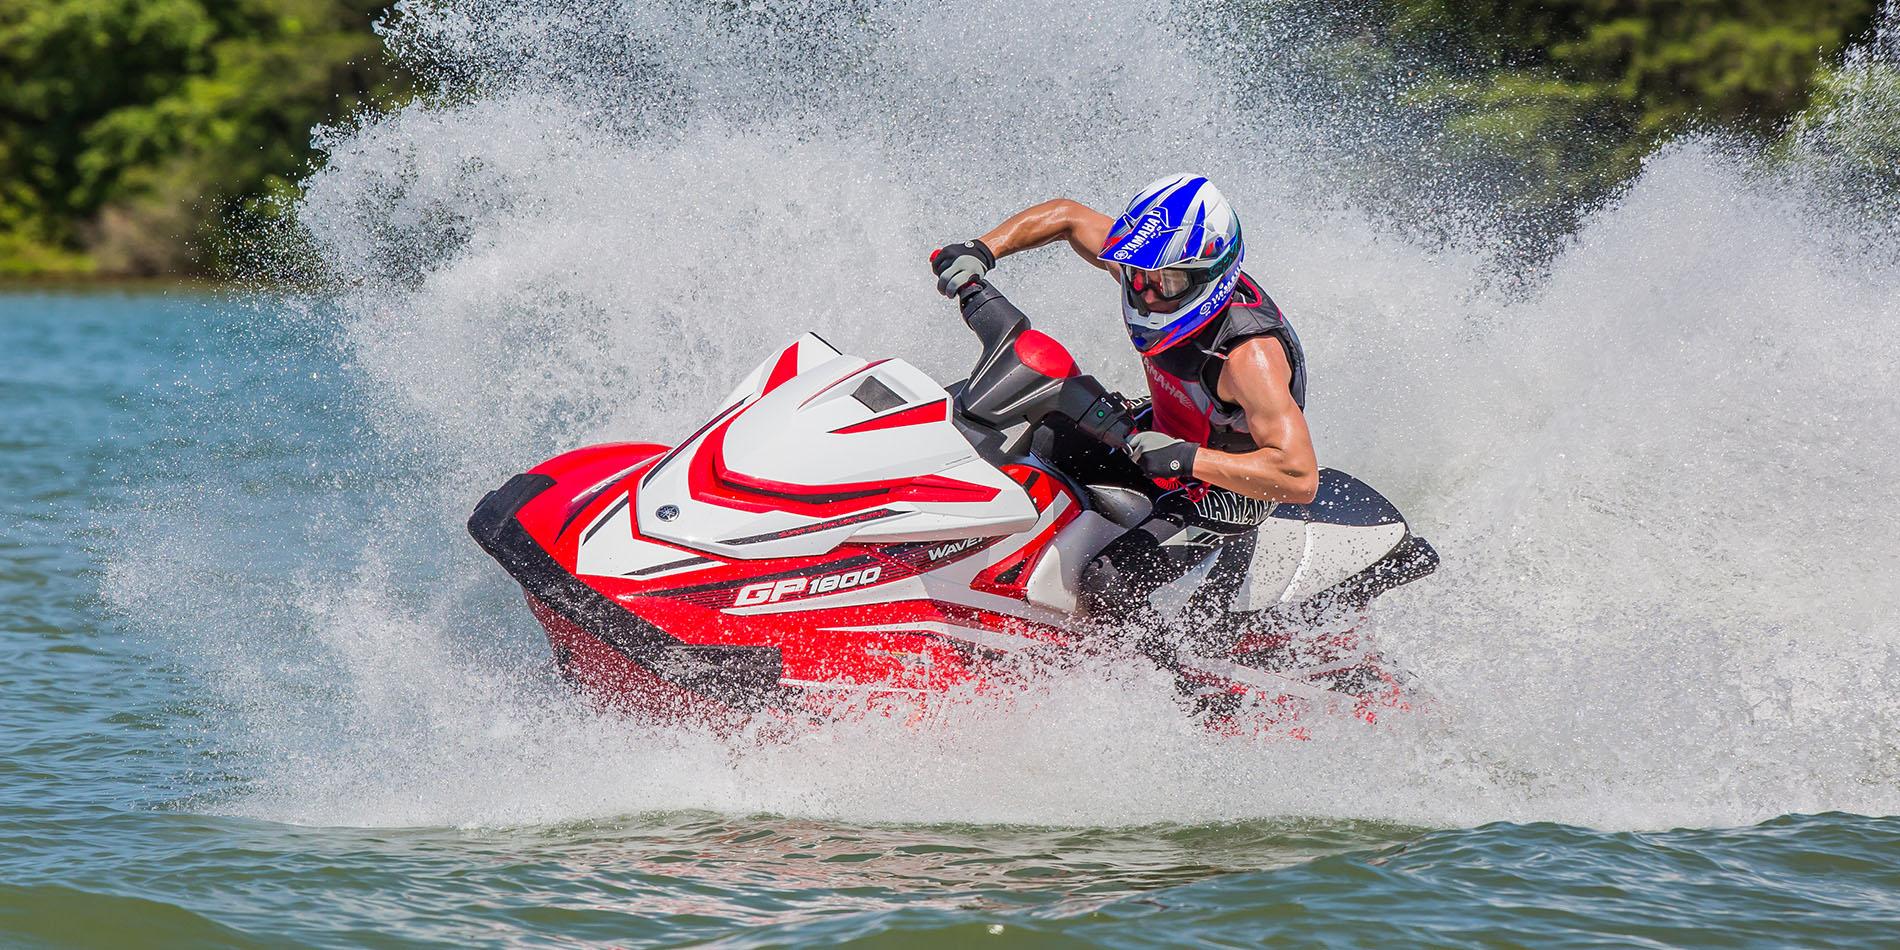 AquaX | Pro Rider Watercraft Magazine - Part 3